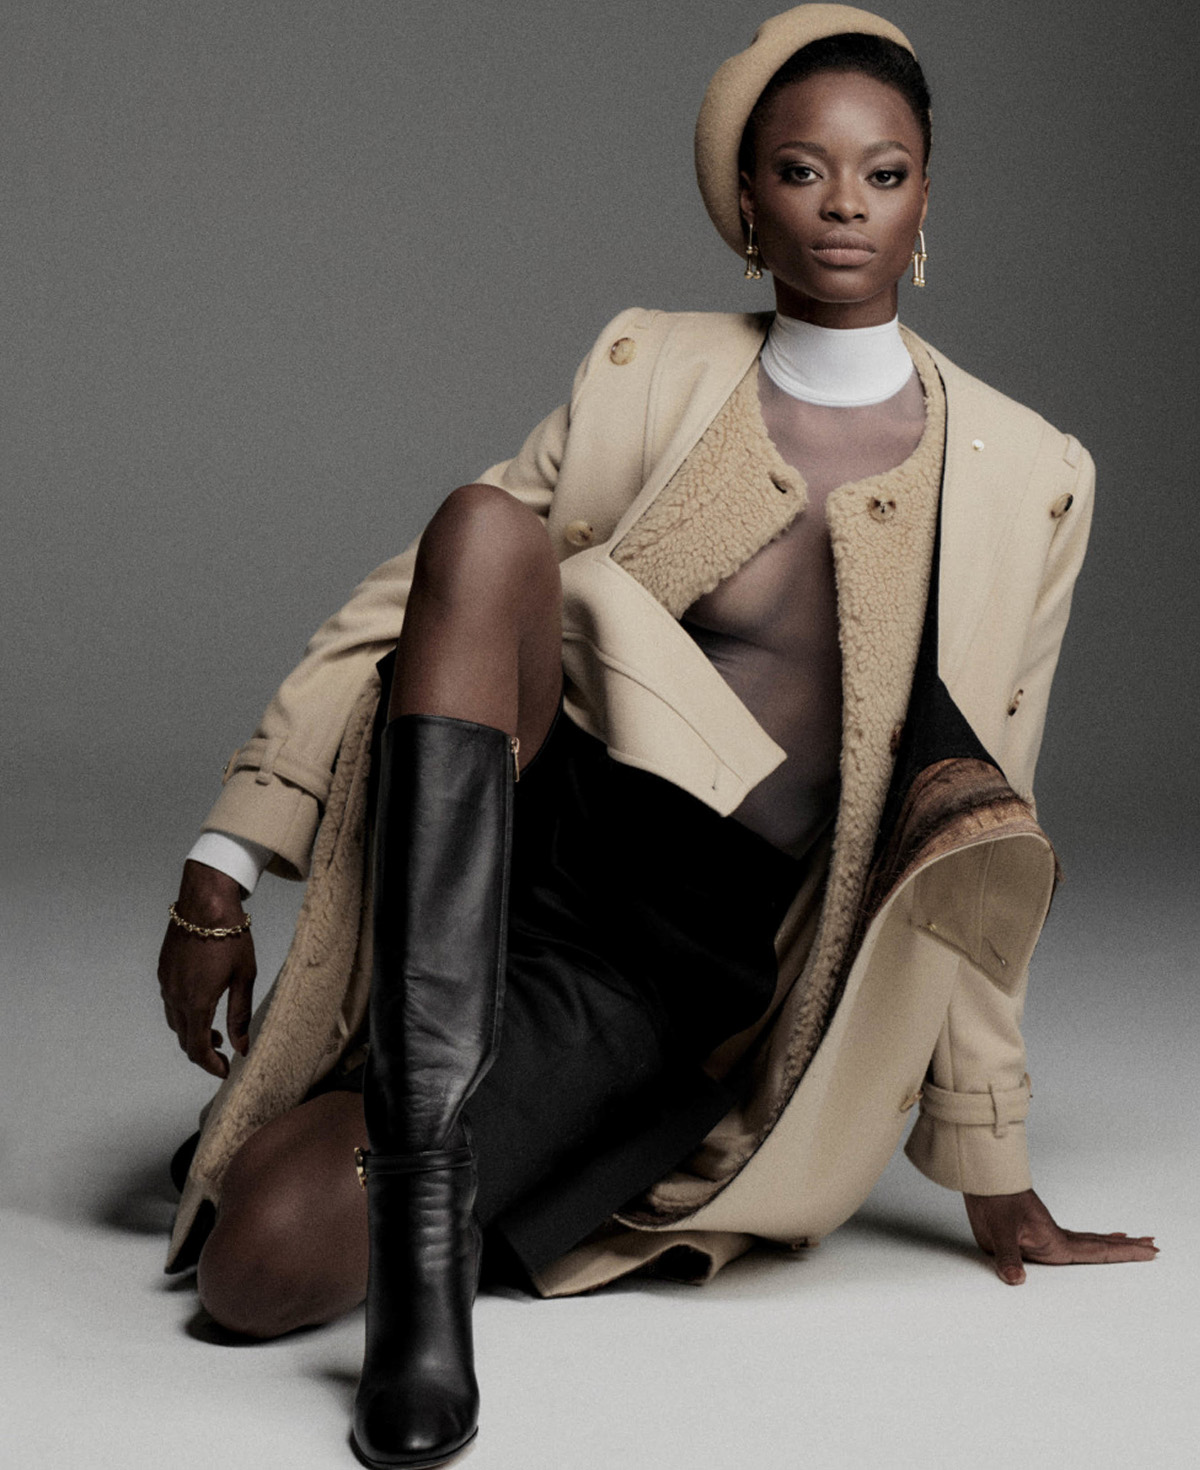 Mayowa Nicholas by Chris Colls for Elle US September 2021